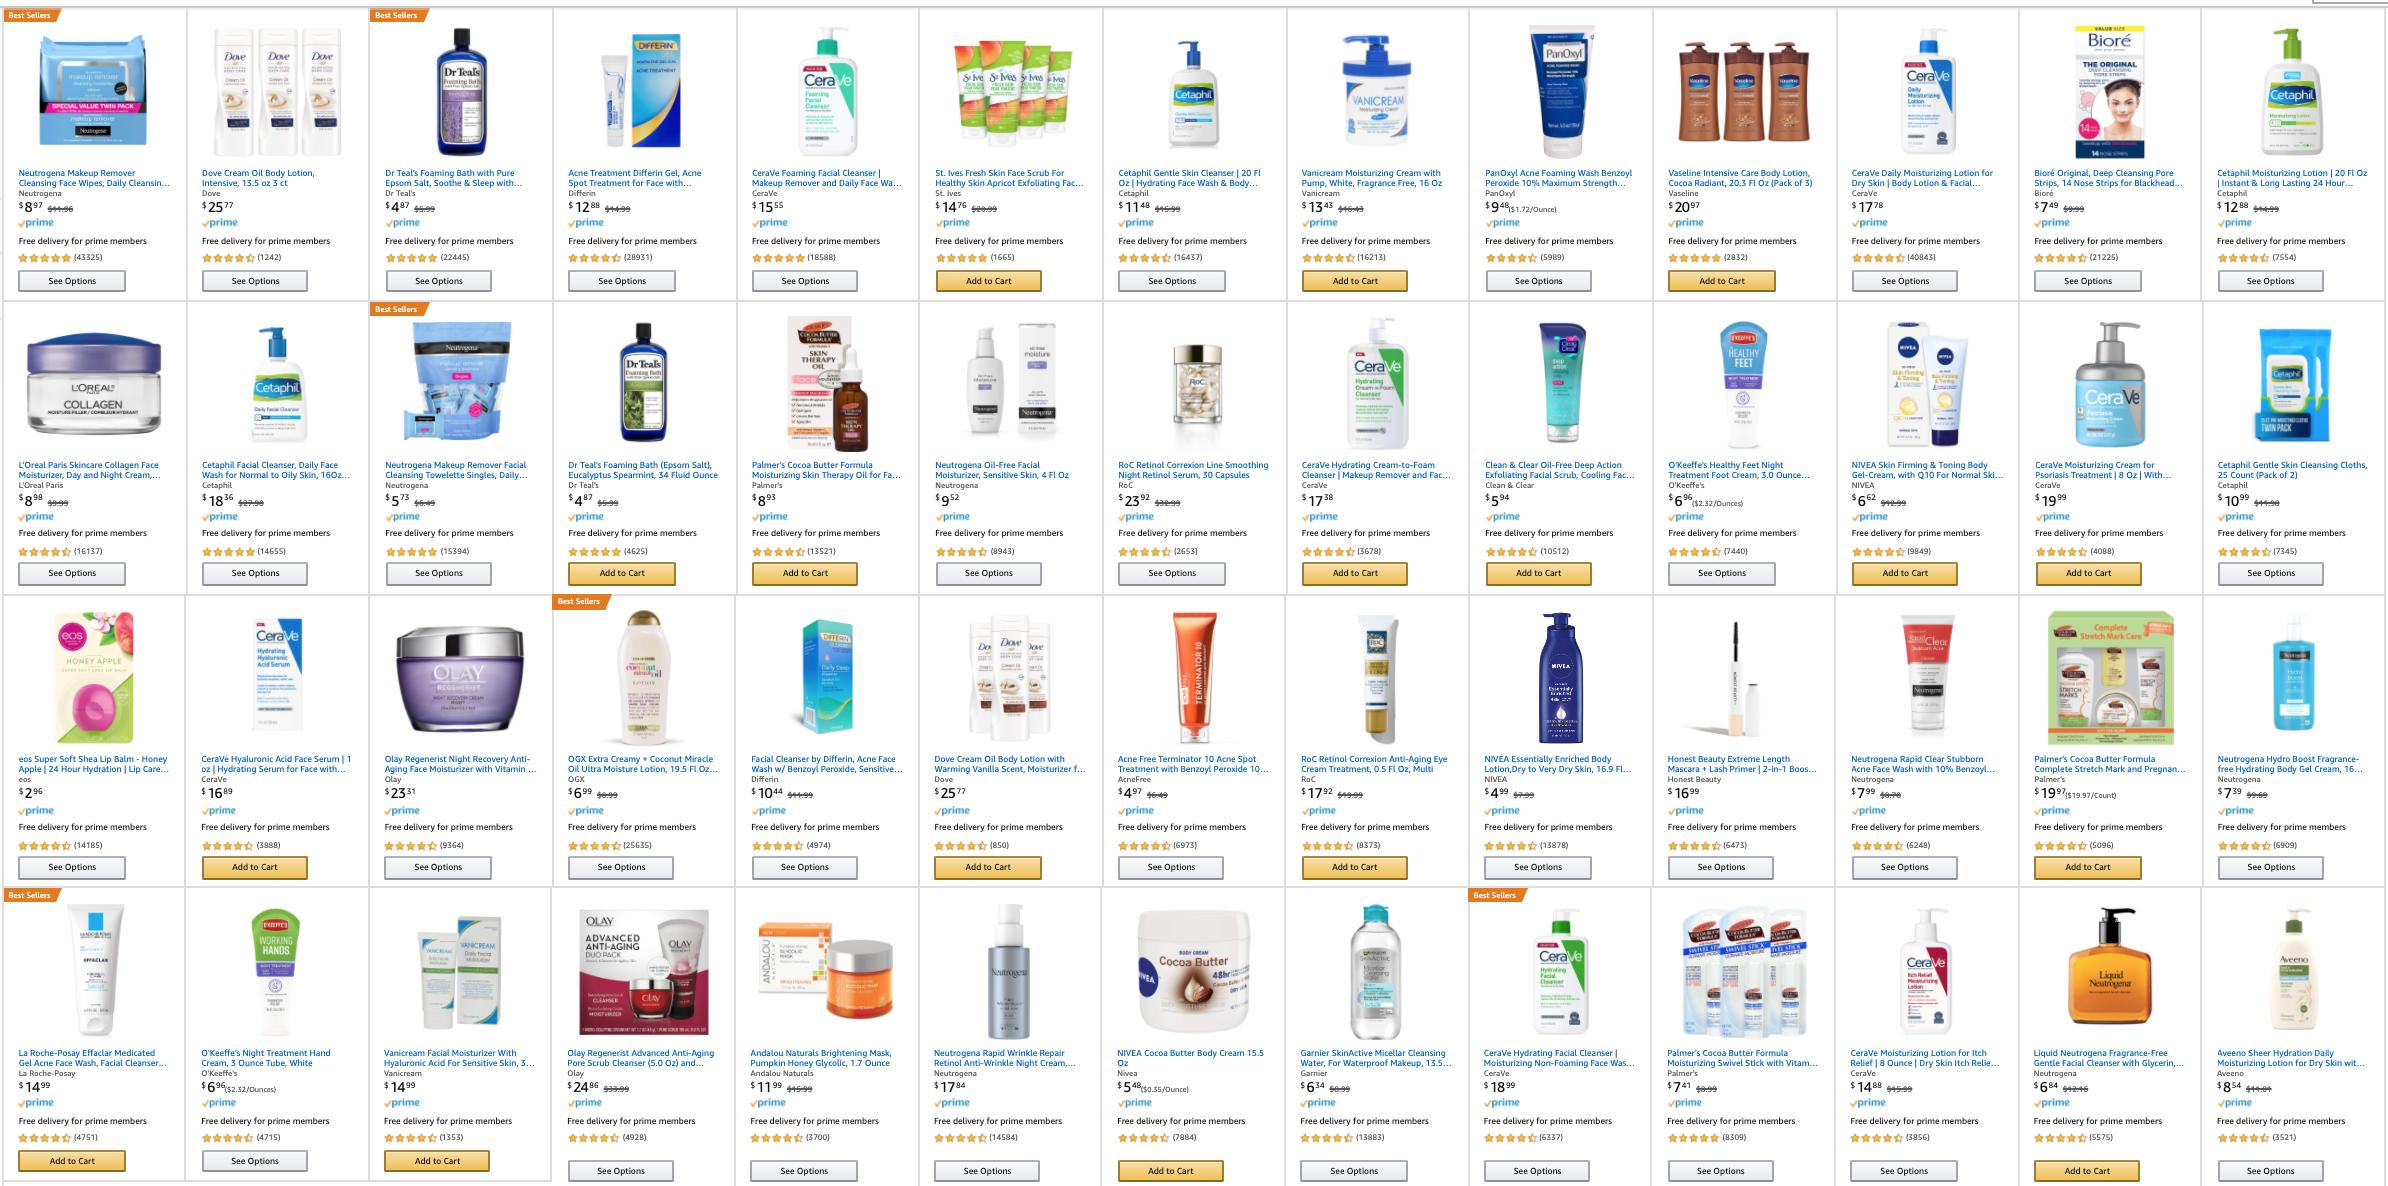 Amazon $5 off $25 coupon